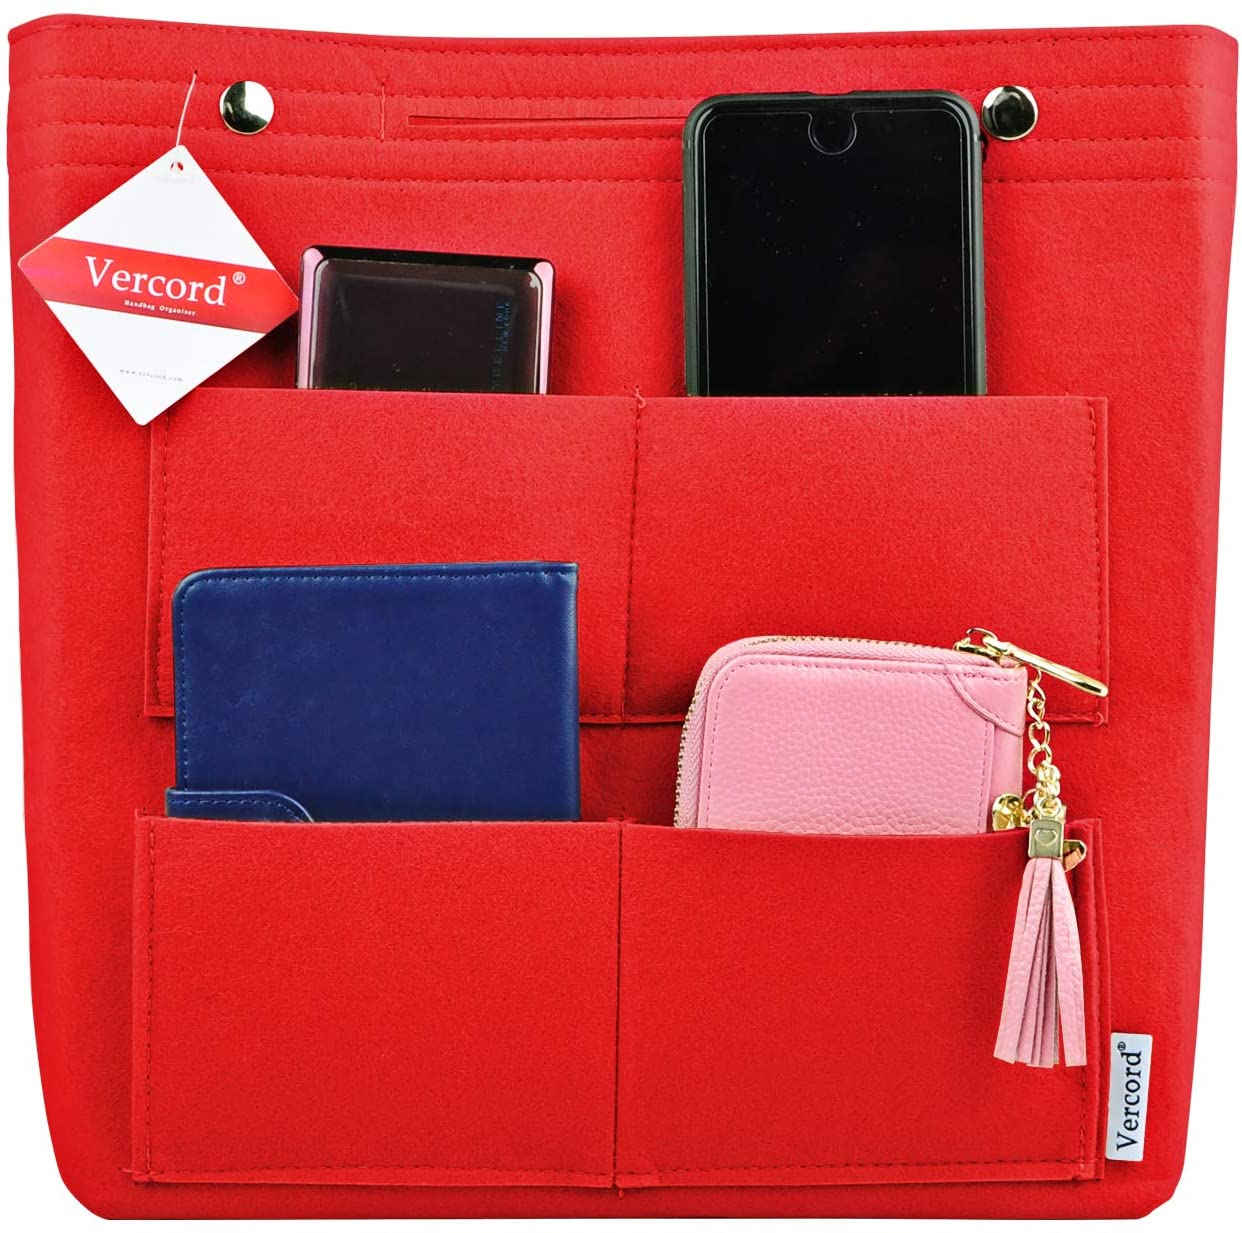 Vercord Felt Tall Long Purse Tote Backpack Bag Insert Organizer Inside for Women Red